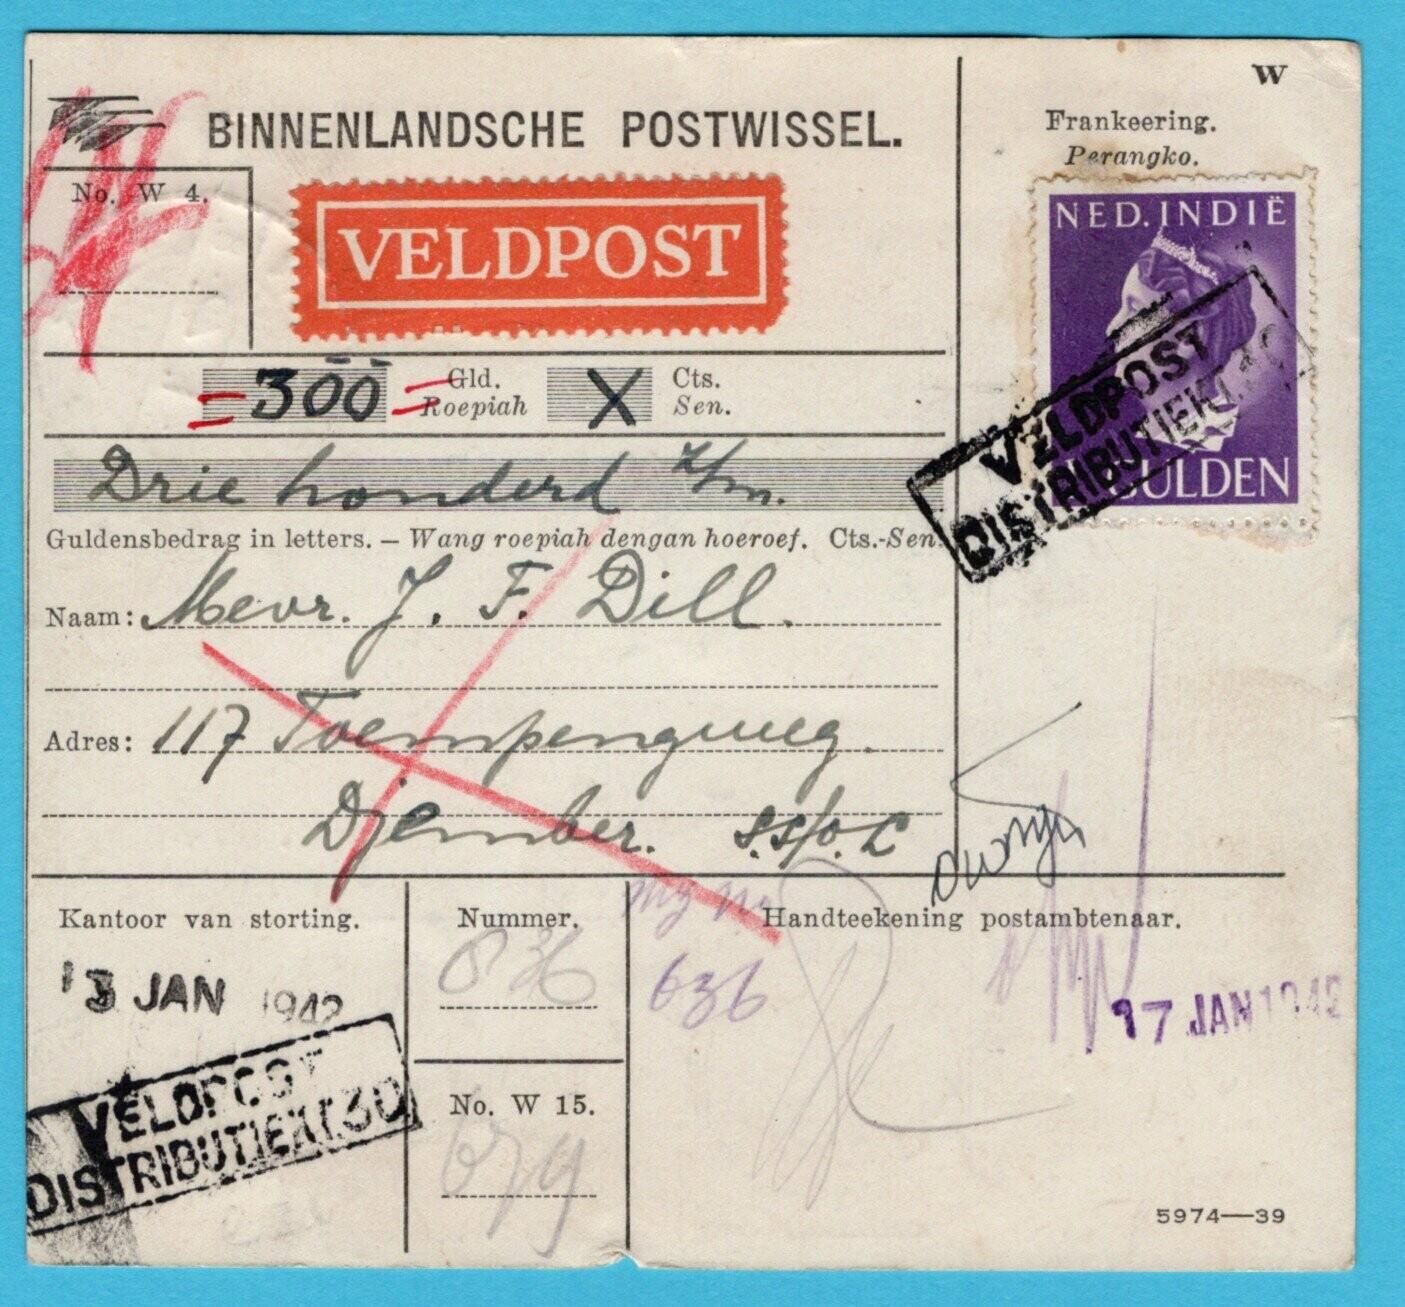 NETHERLANDS EAST INDIES money order 1942 Fieldpost 30